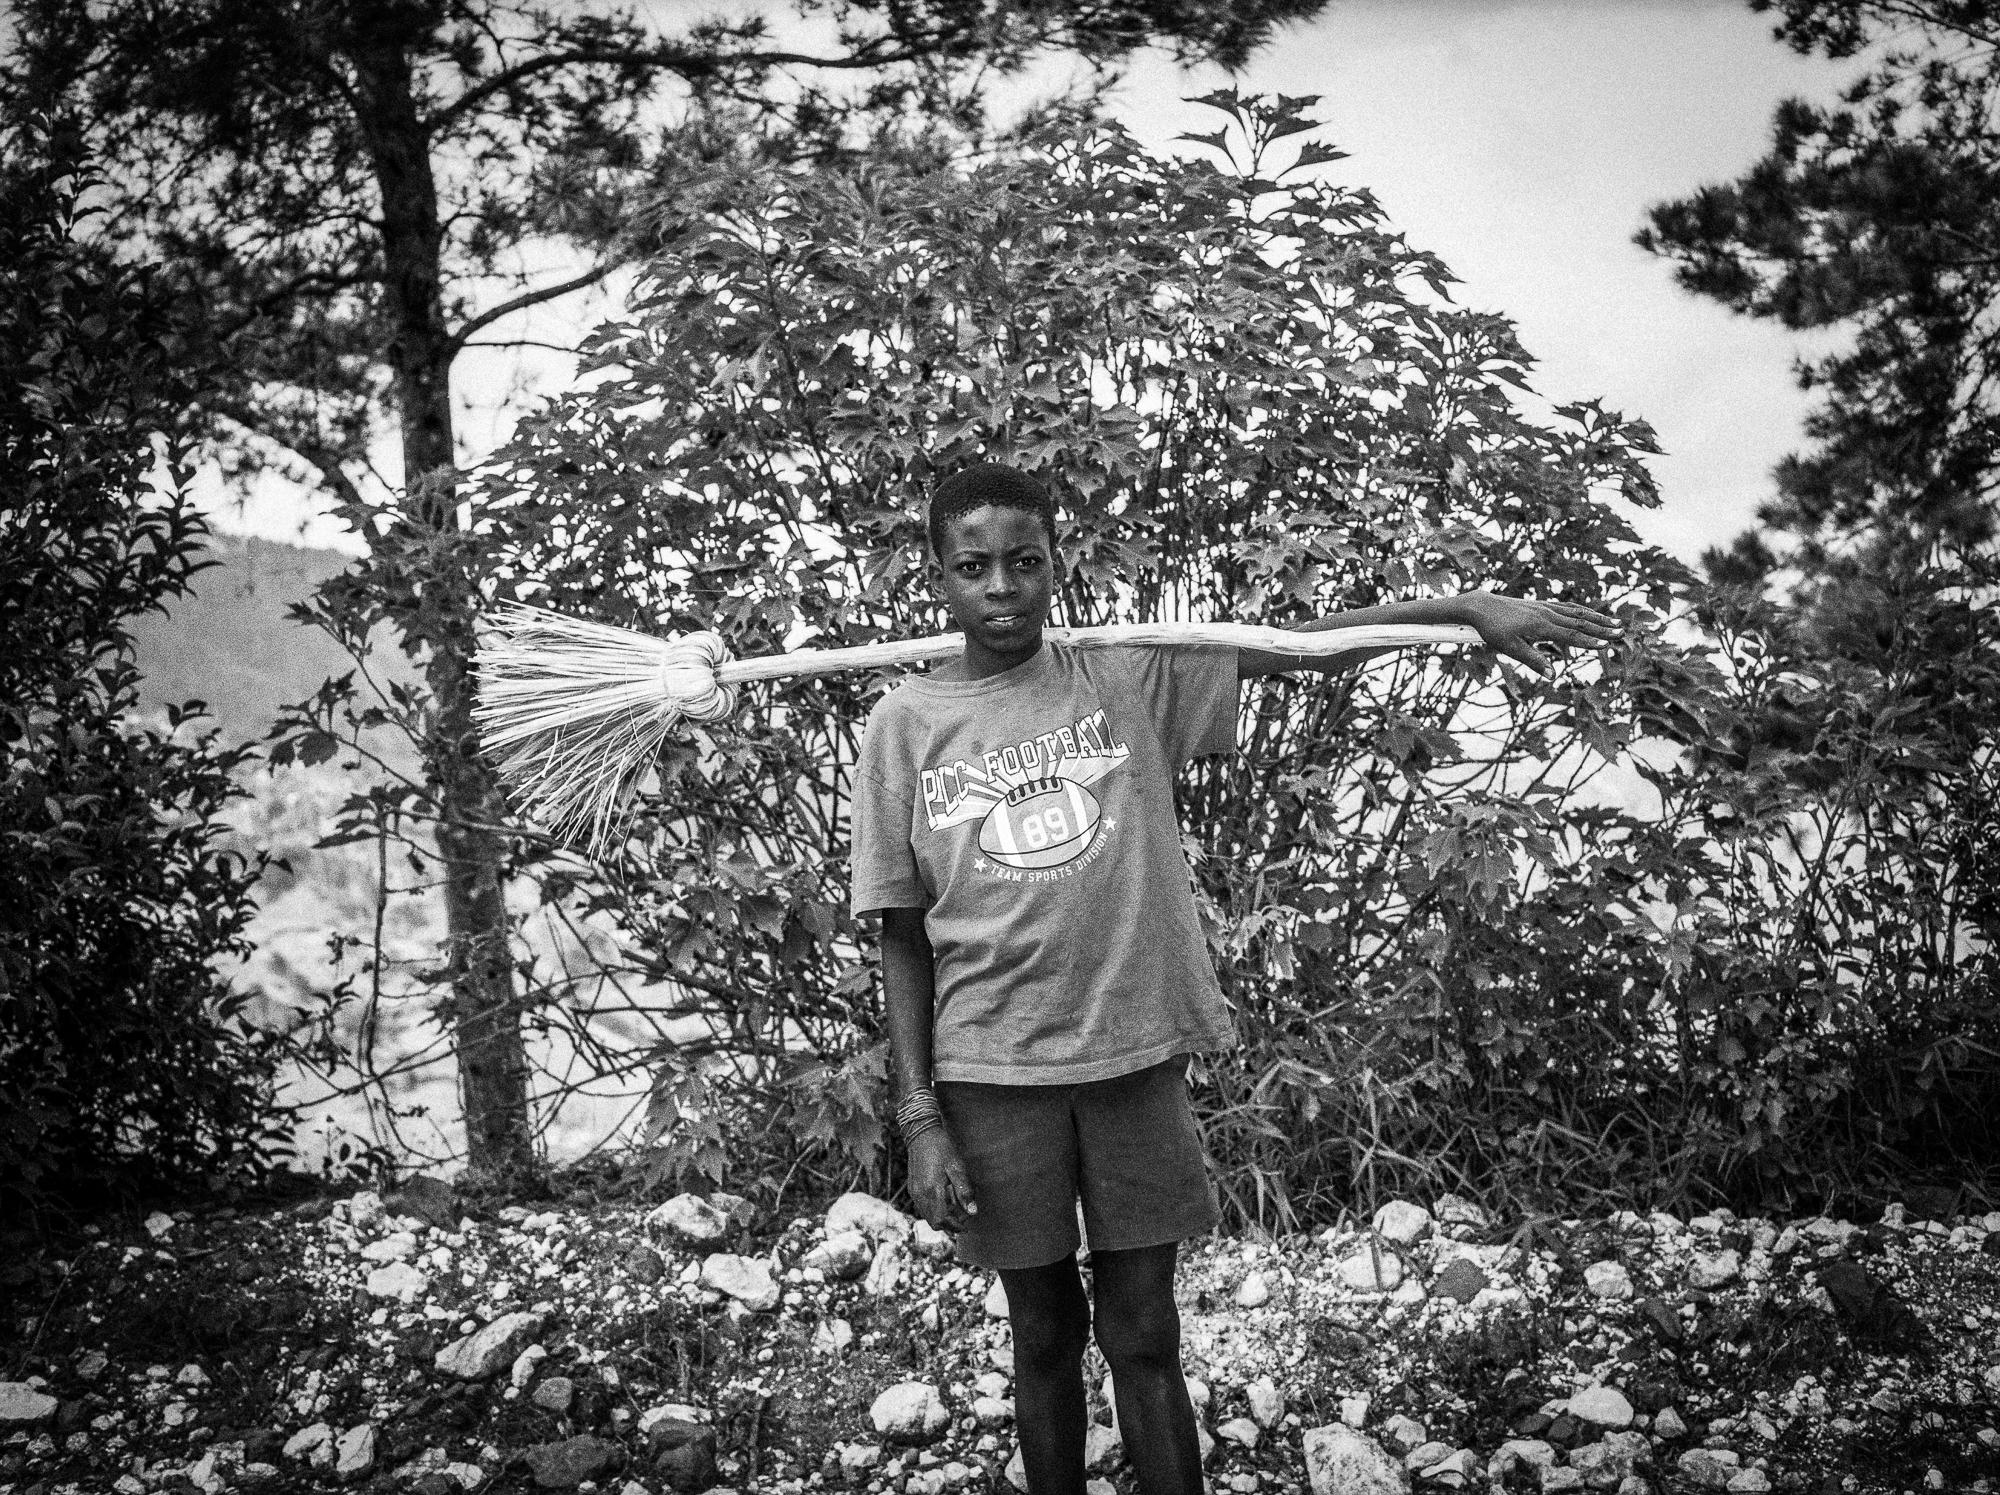 Boy with broom.jpg